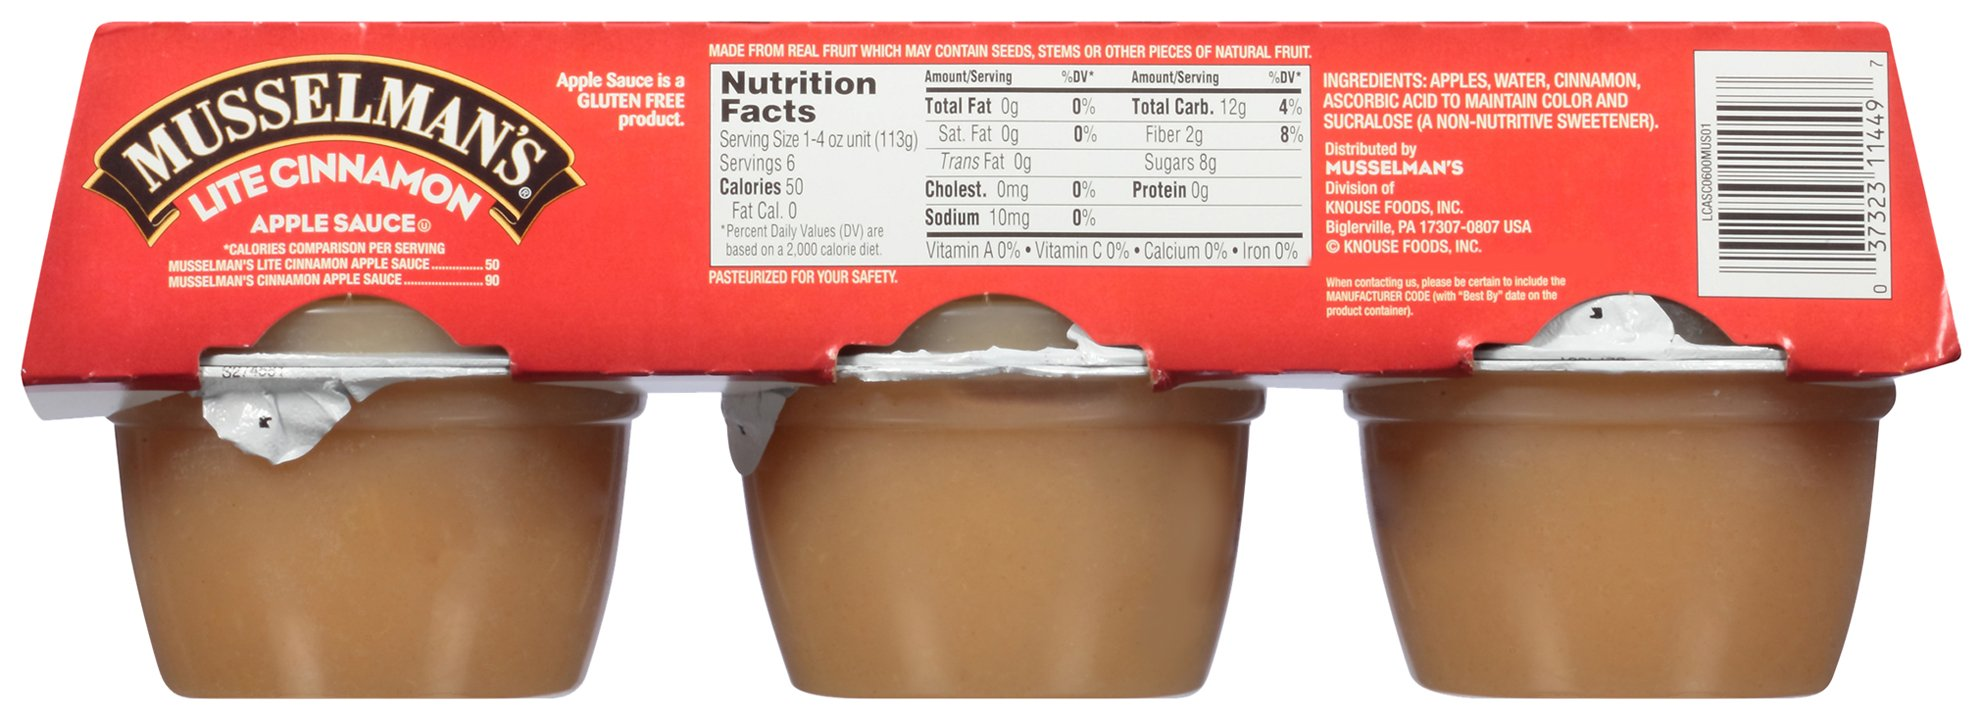 Musselman's Lite Cinnamon Apple Sauce, 4 Ounce (Pack of 12) by Musselmans (Image #2)